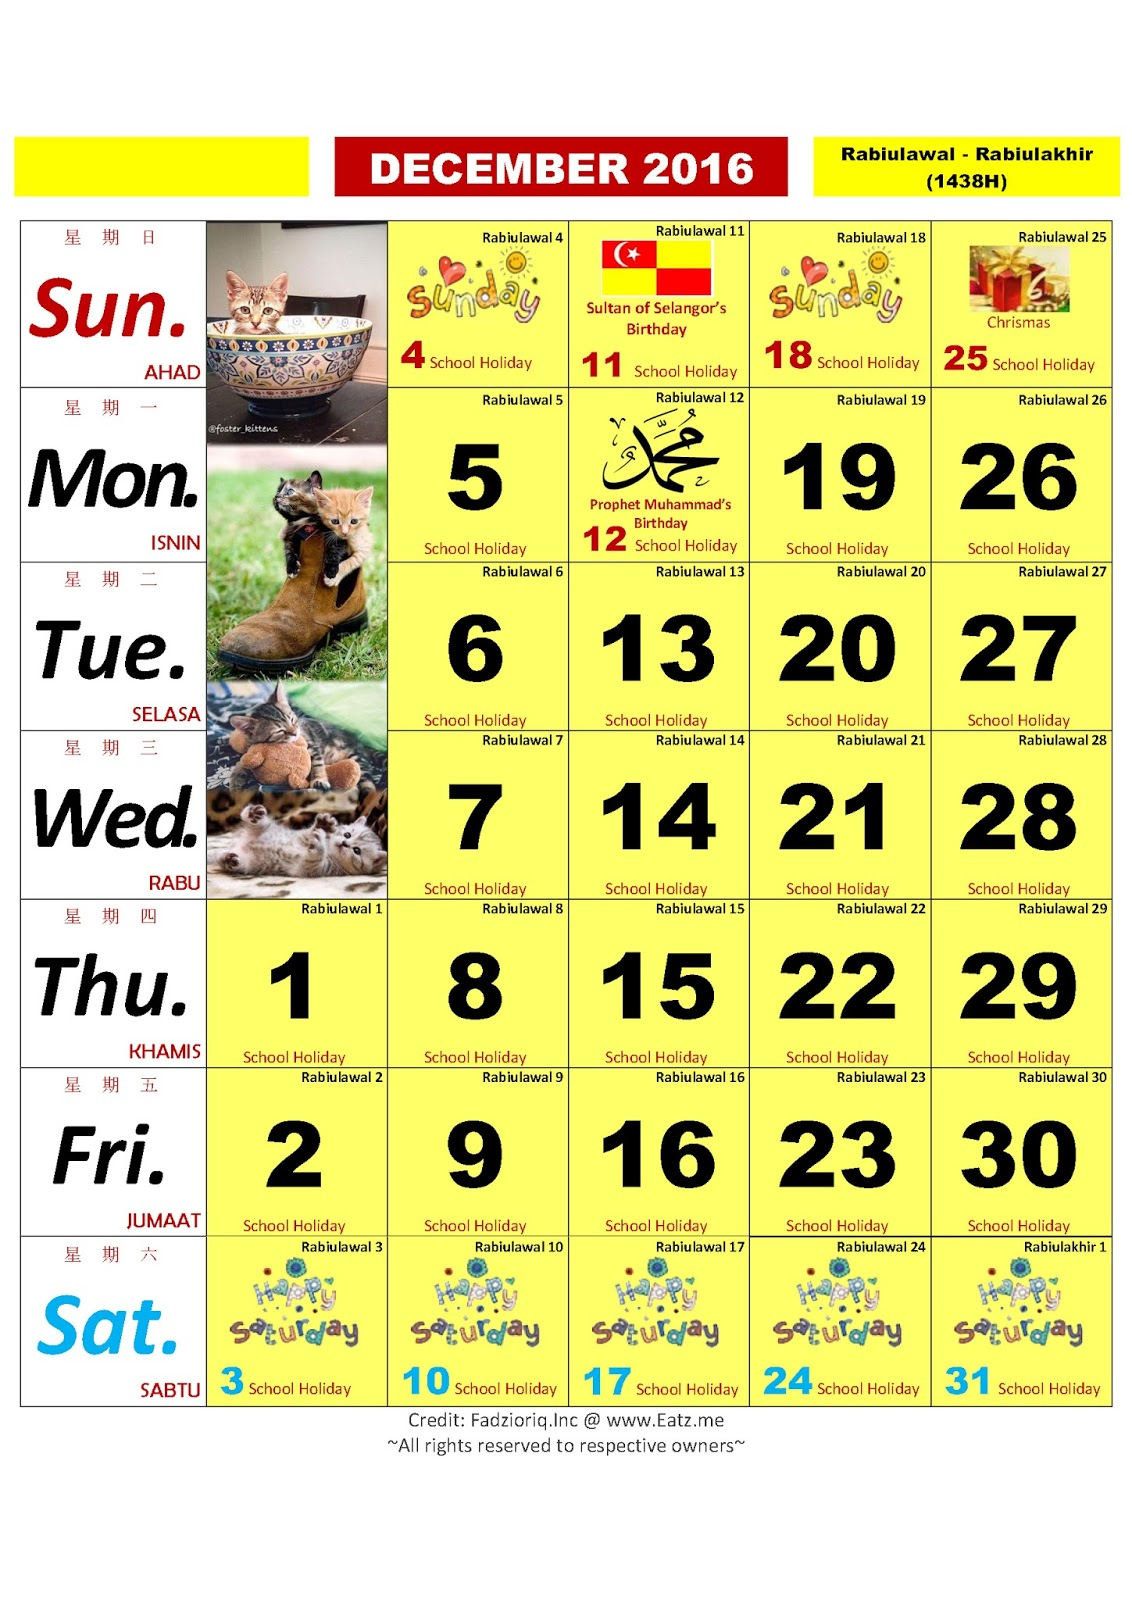 Calendar Kuda : Koleksi filem melayu antarabangsa info kalender kuda